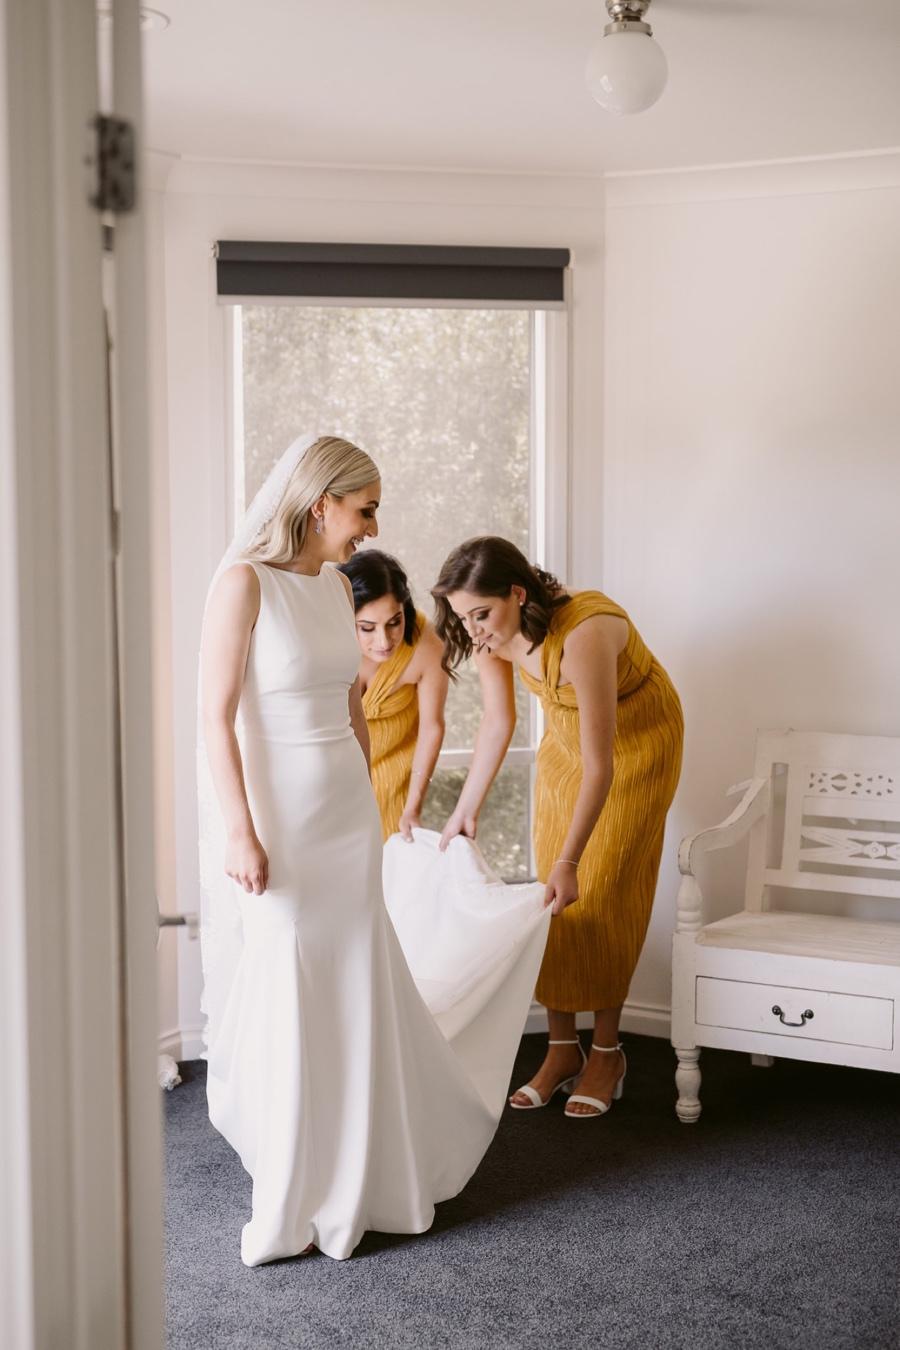 Quat Quatta Melbourne Wedding Photography25.jpg